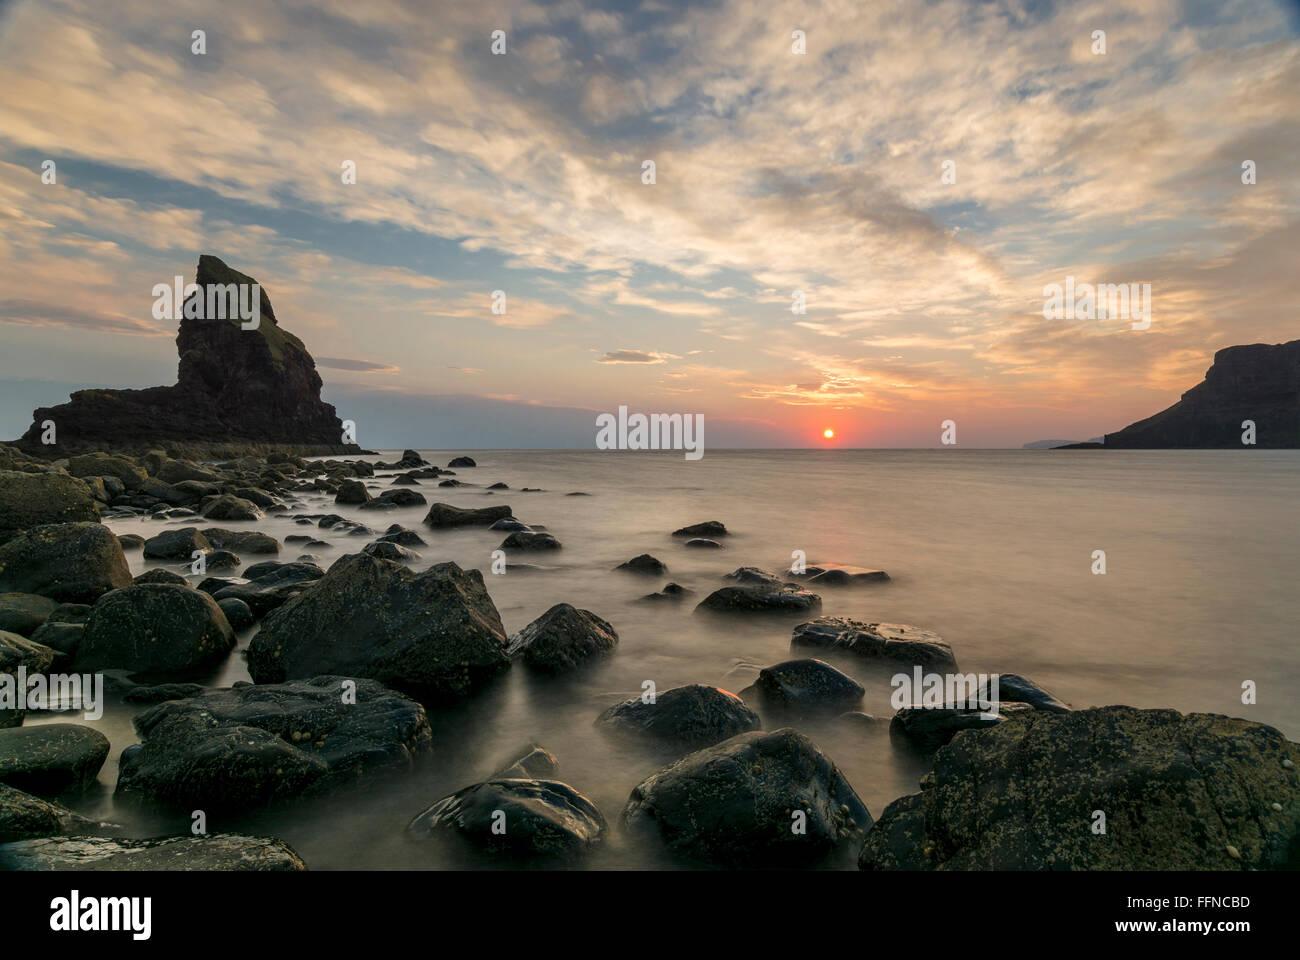 talisker bay at sunset rocks on shore at west coast Stock Photo